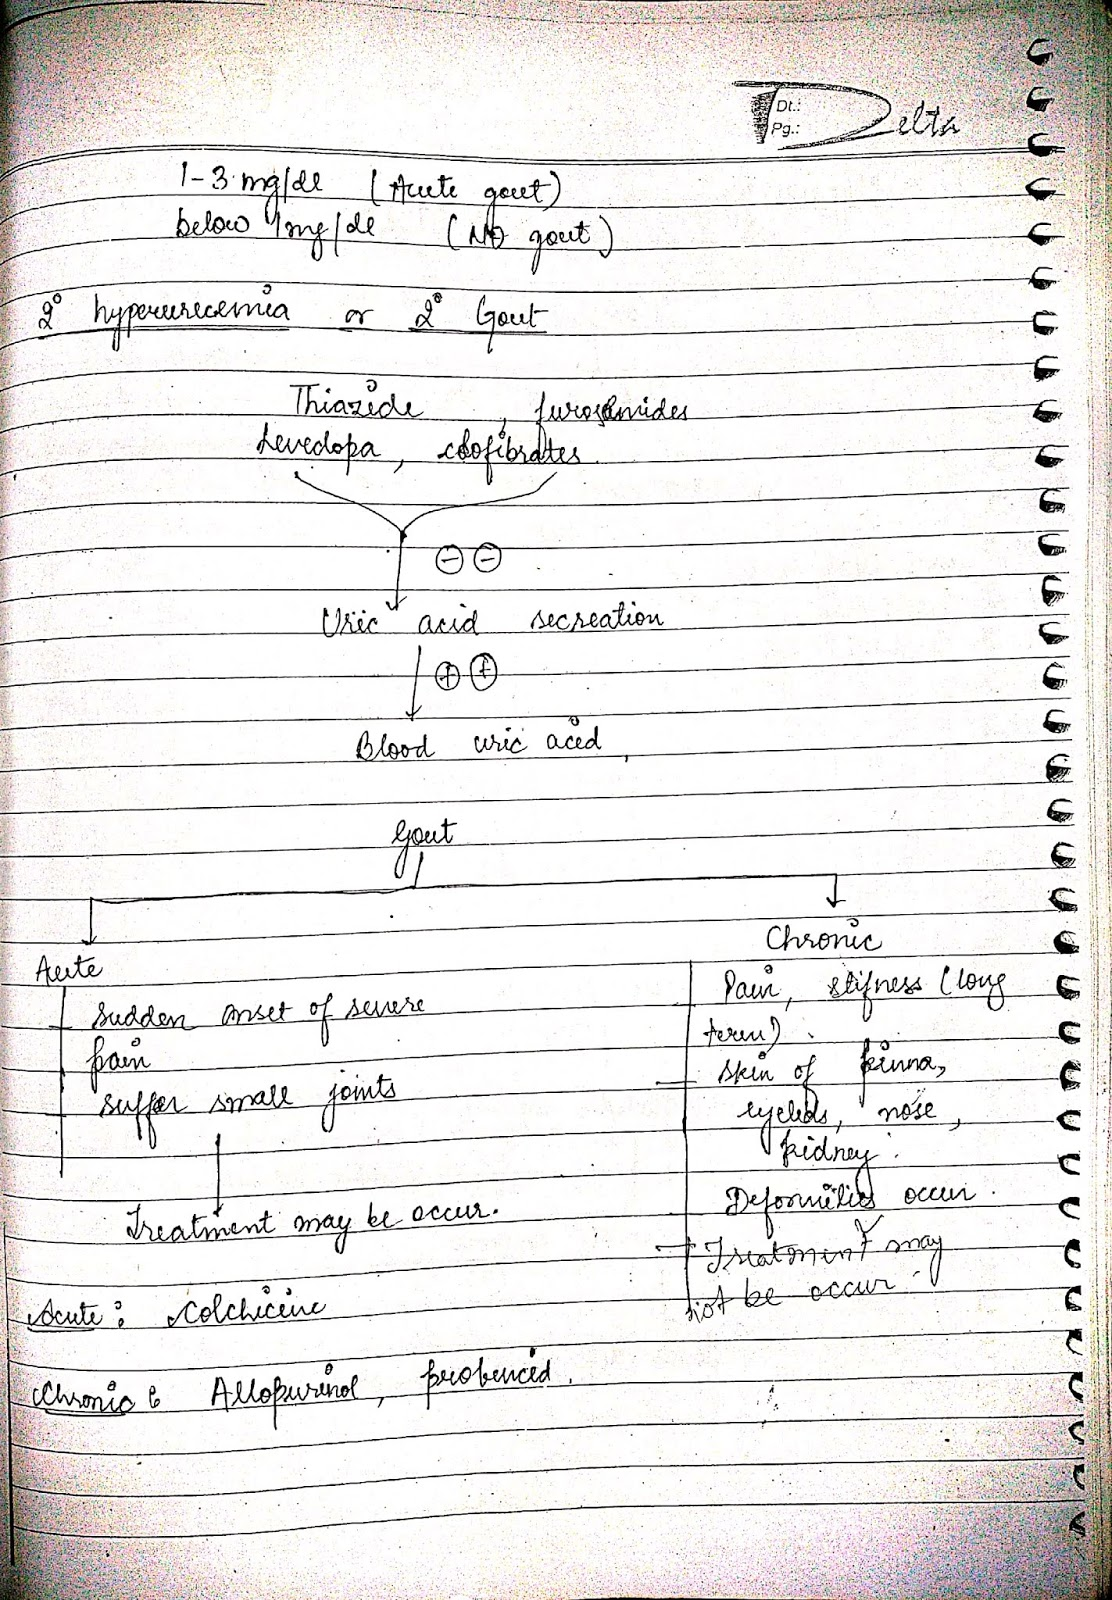 pathophysiology - gout